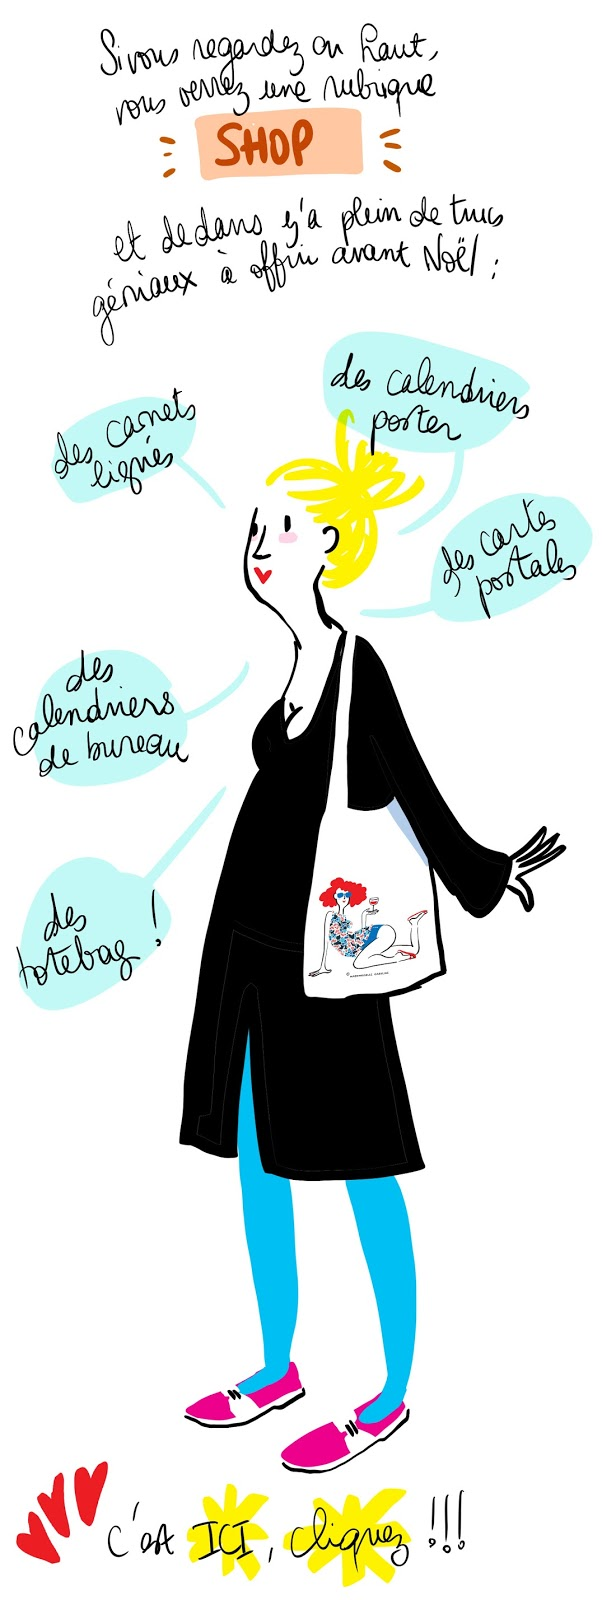 http://www.mademoisellecaroline.com/p/shop.html